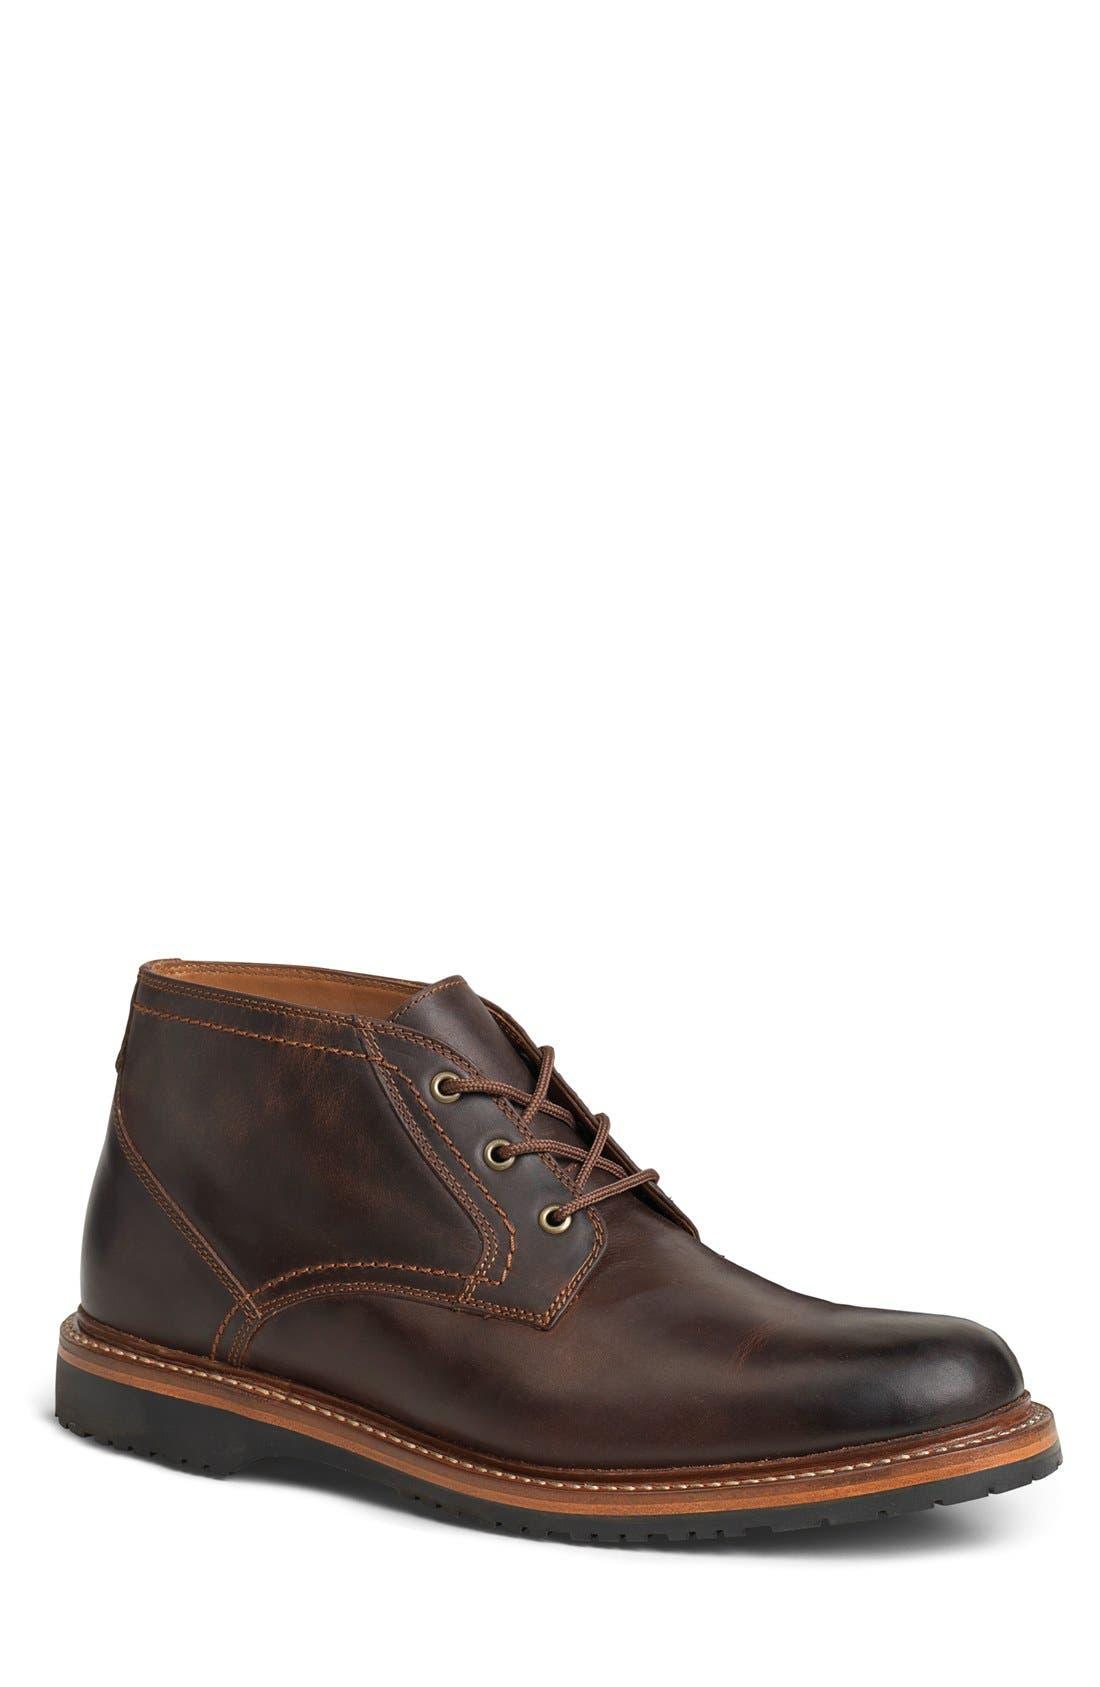 Arlington Chukka Boot,                         Main,                         color, BROWN